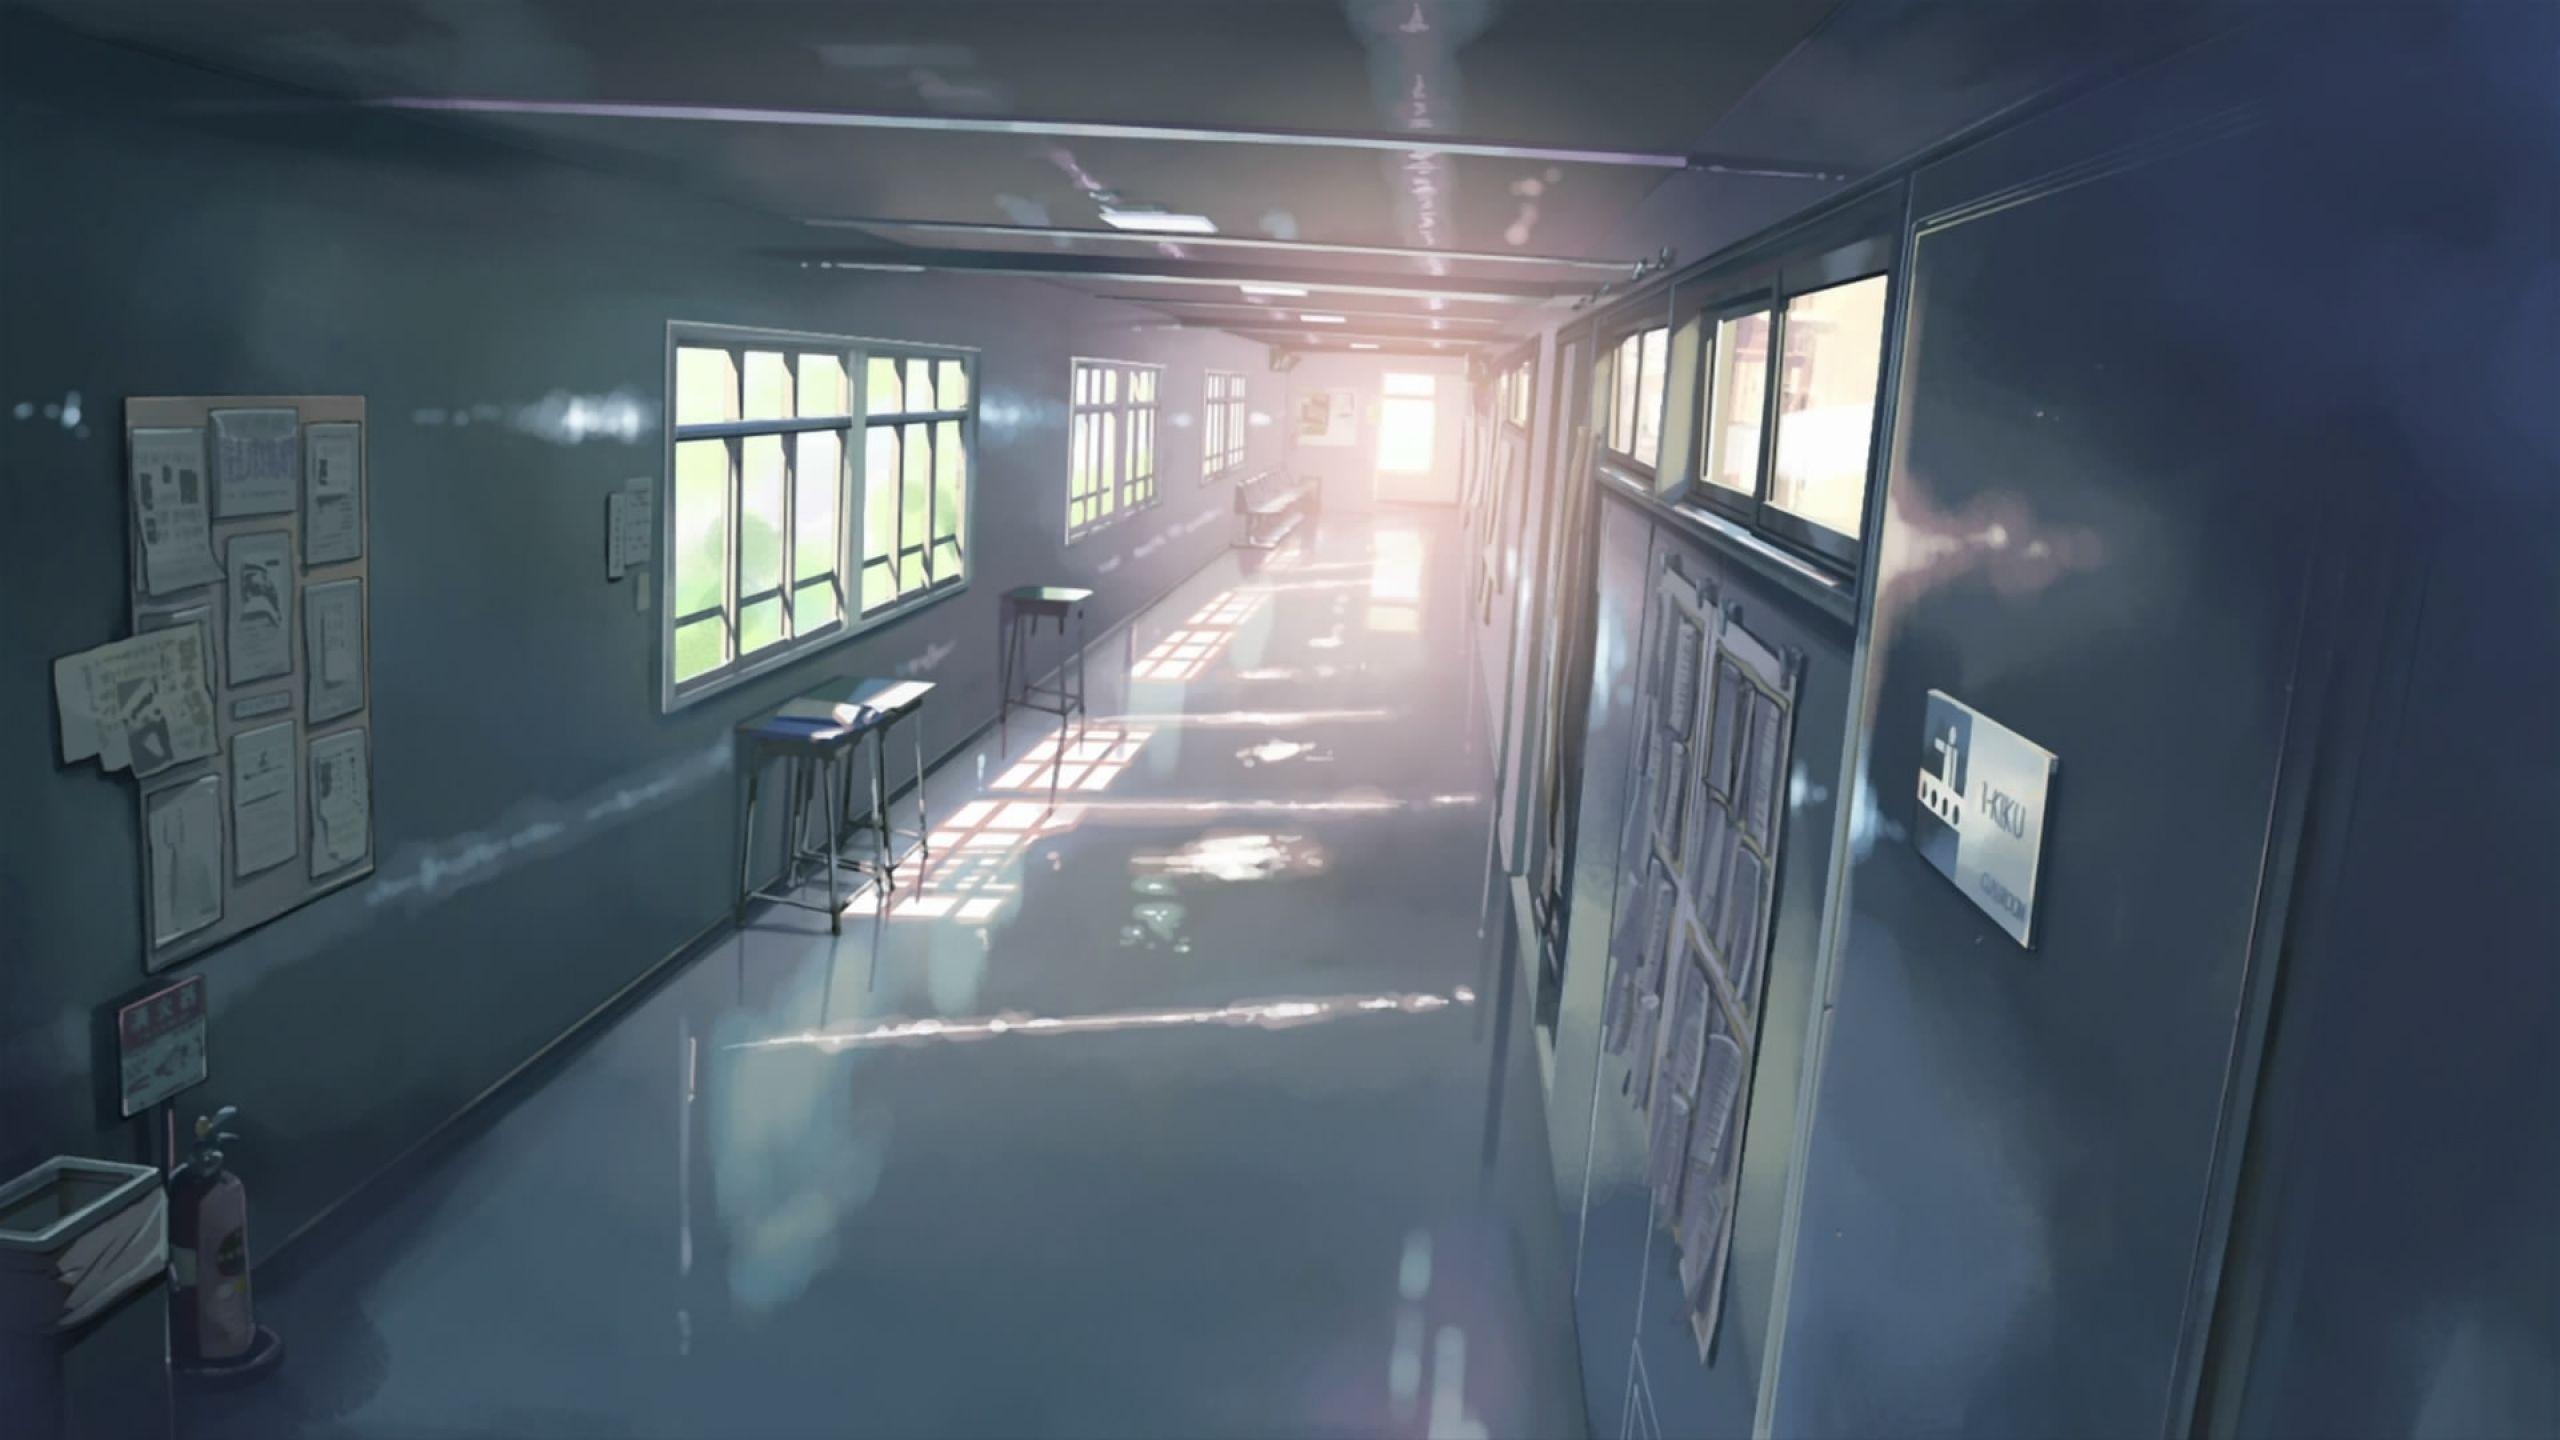 school makoto shinkai hallway 5 centimeters per second